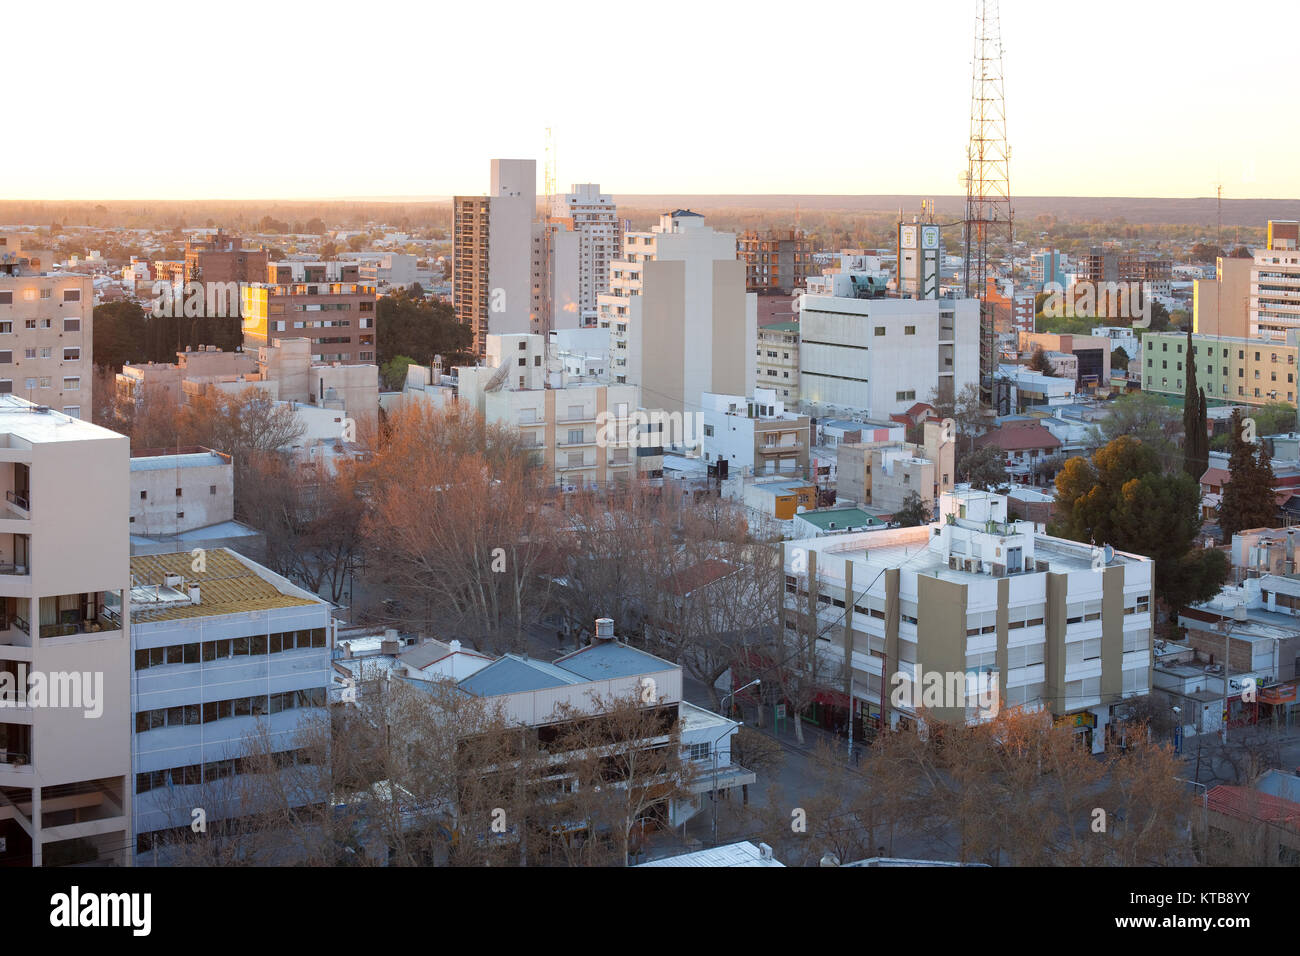 Neuquén, provincia de Neuquén, Argentina, la ciudad de Neuquén, capital de la provincia con el mismo Imagen De Stock